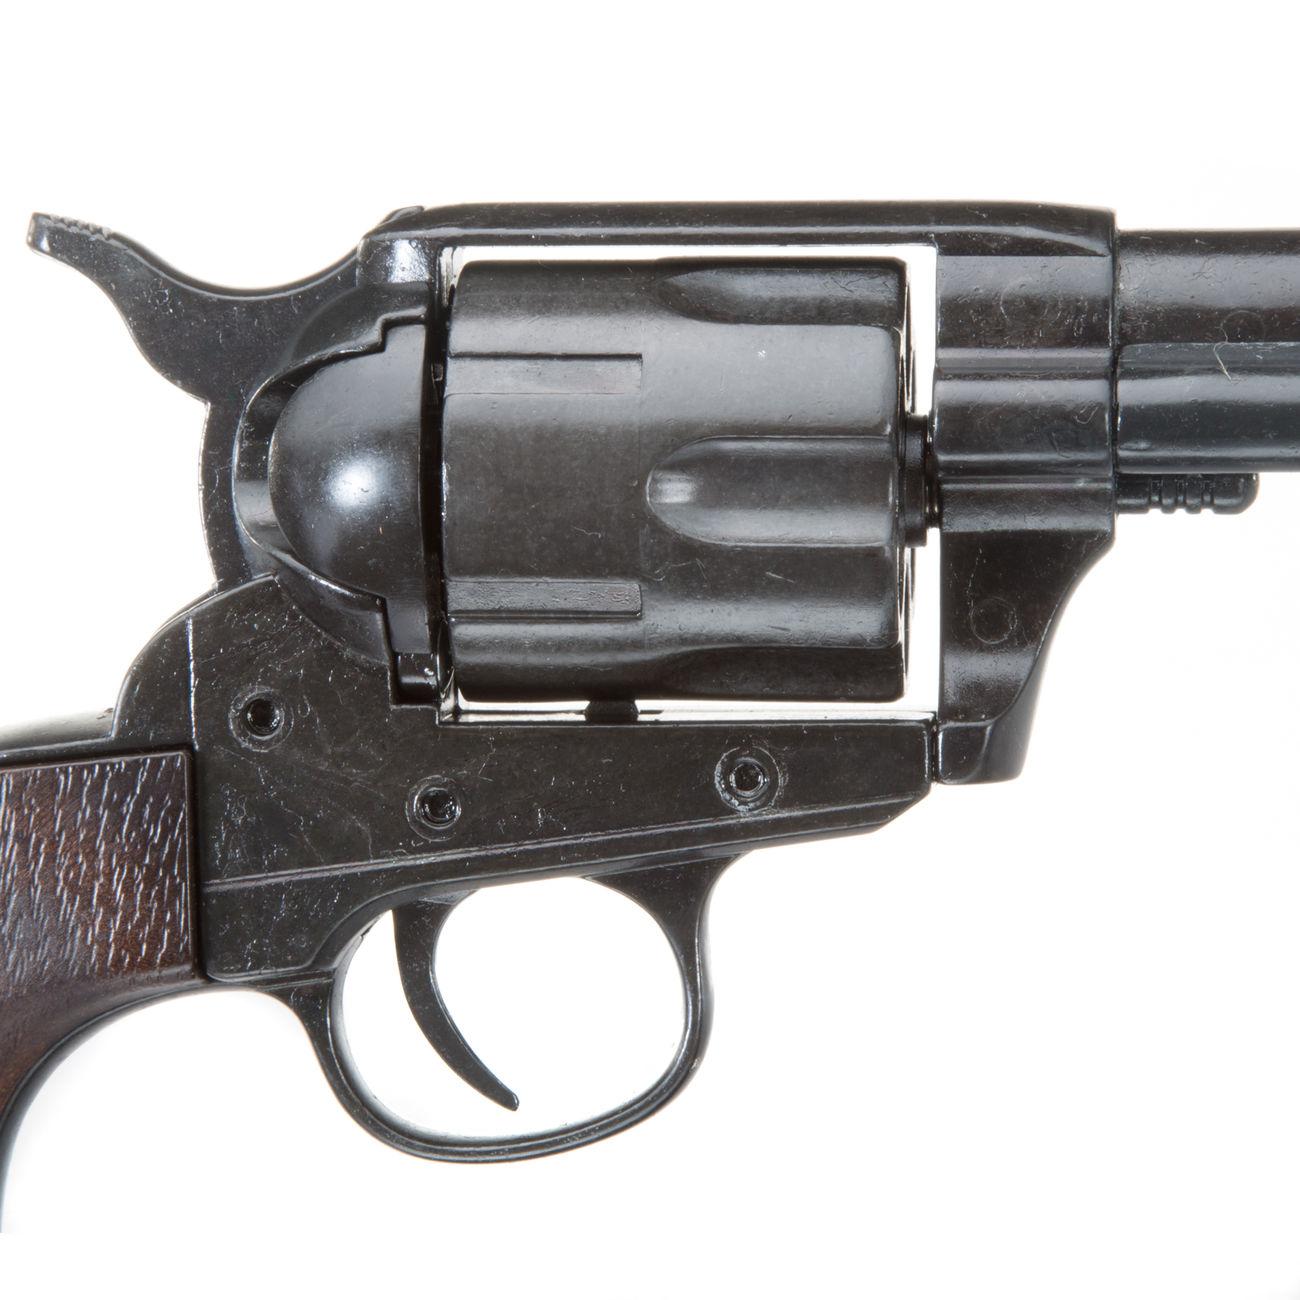 Deko revolver schwarz kotte zeller for Deko schwarz